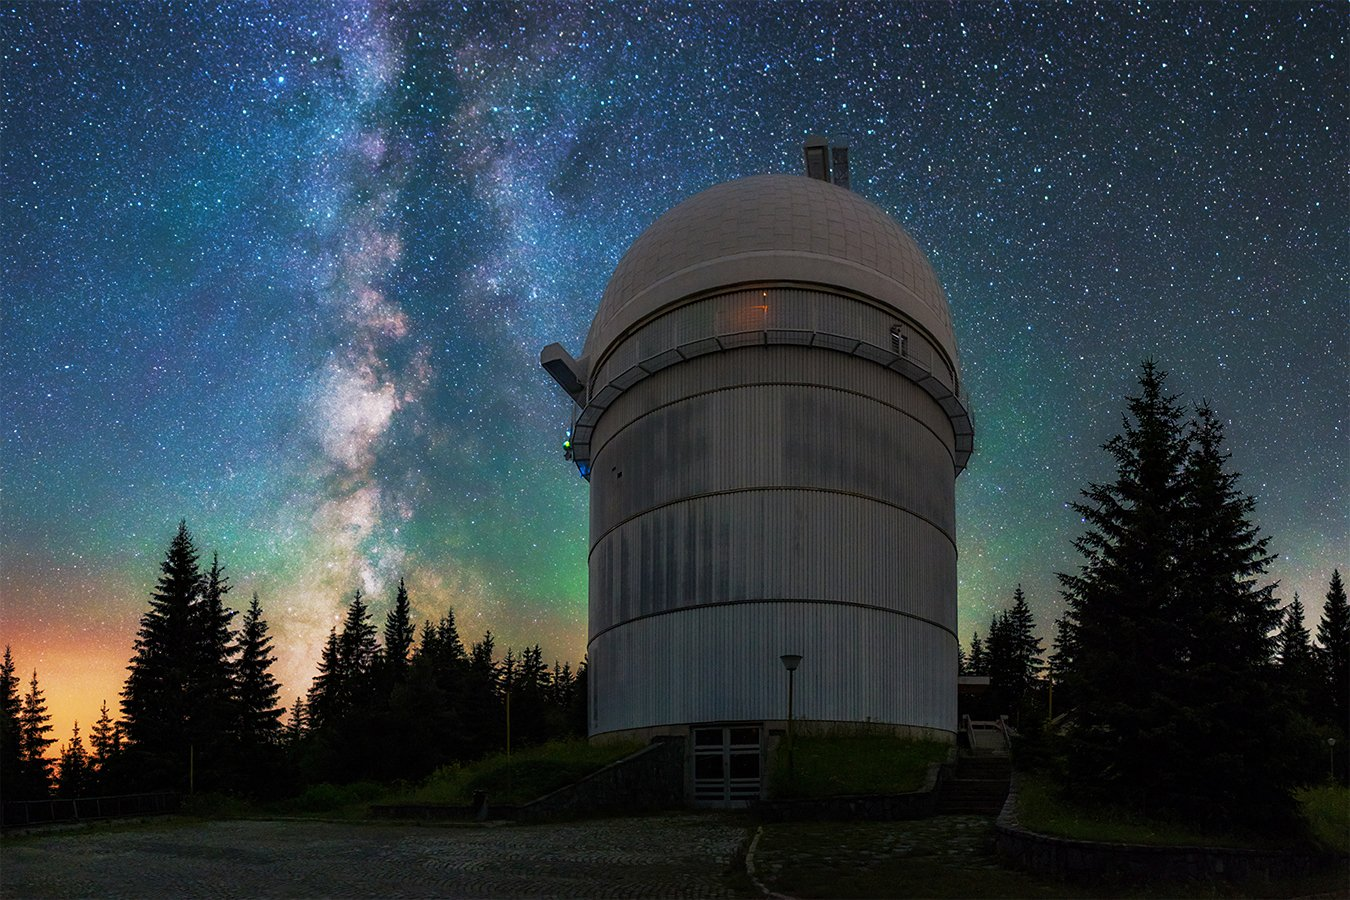 carl zeiss, national astronomical observatory, telescope, milky way, ritchey-chretien-coude, nao rozhen, Иван Падарев